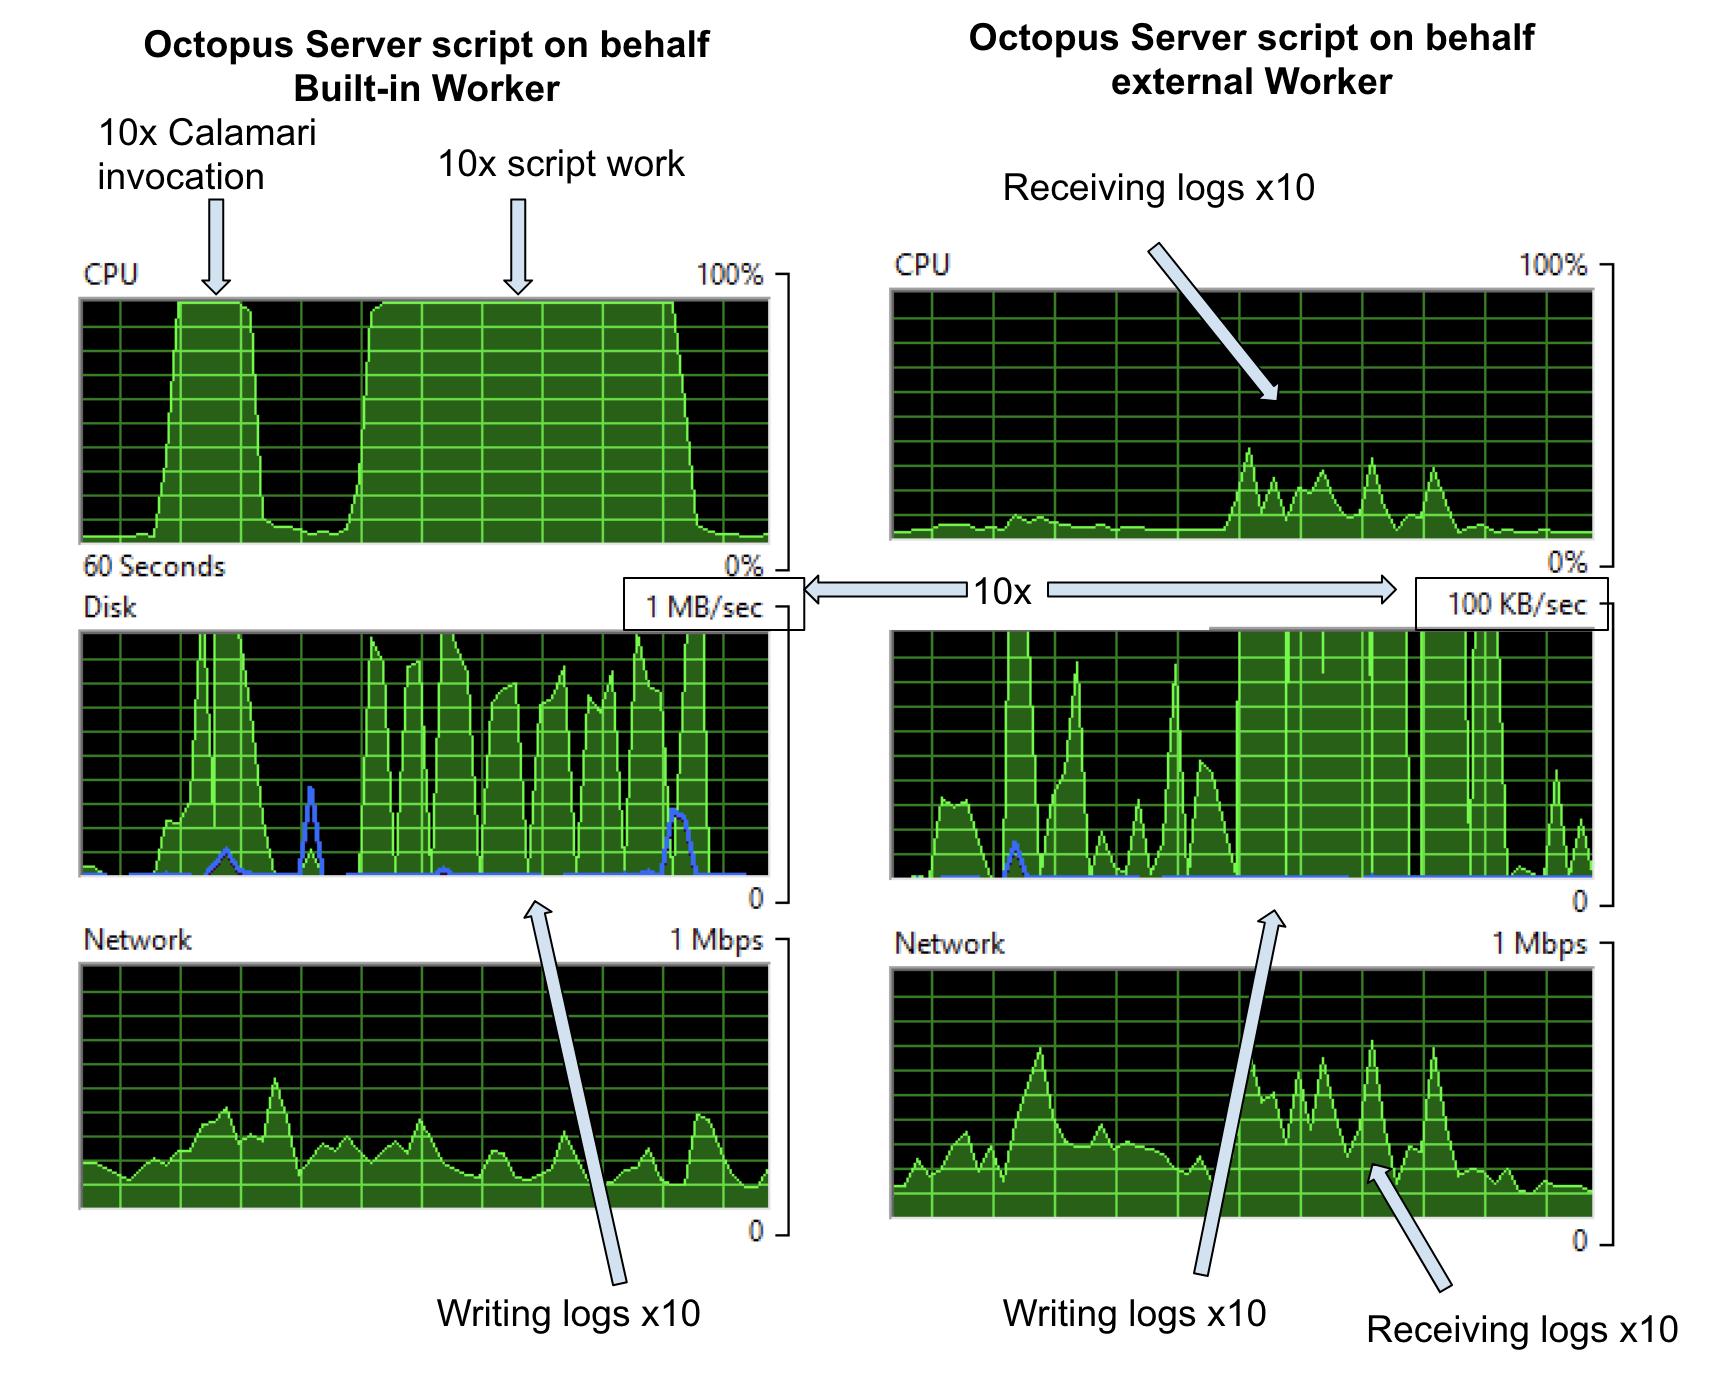 Script Step on behalf performance